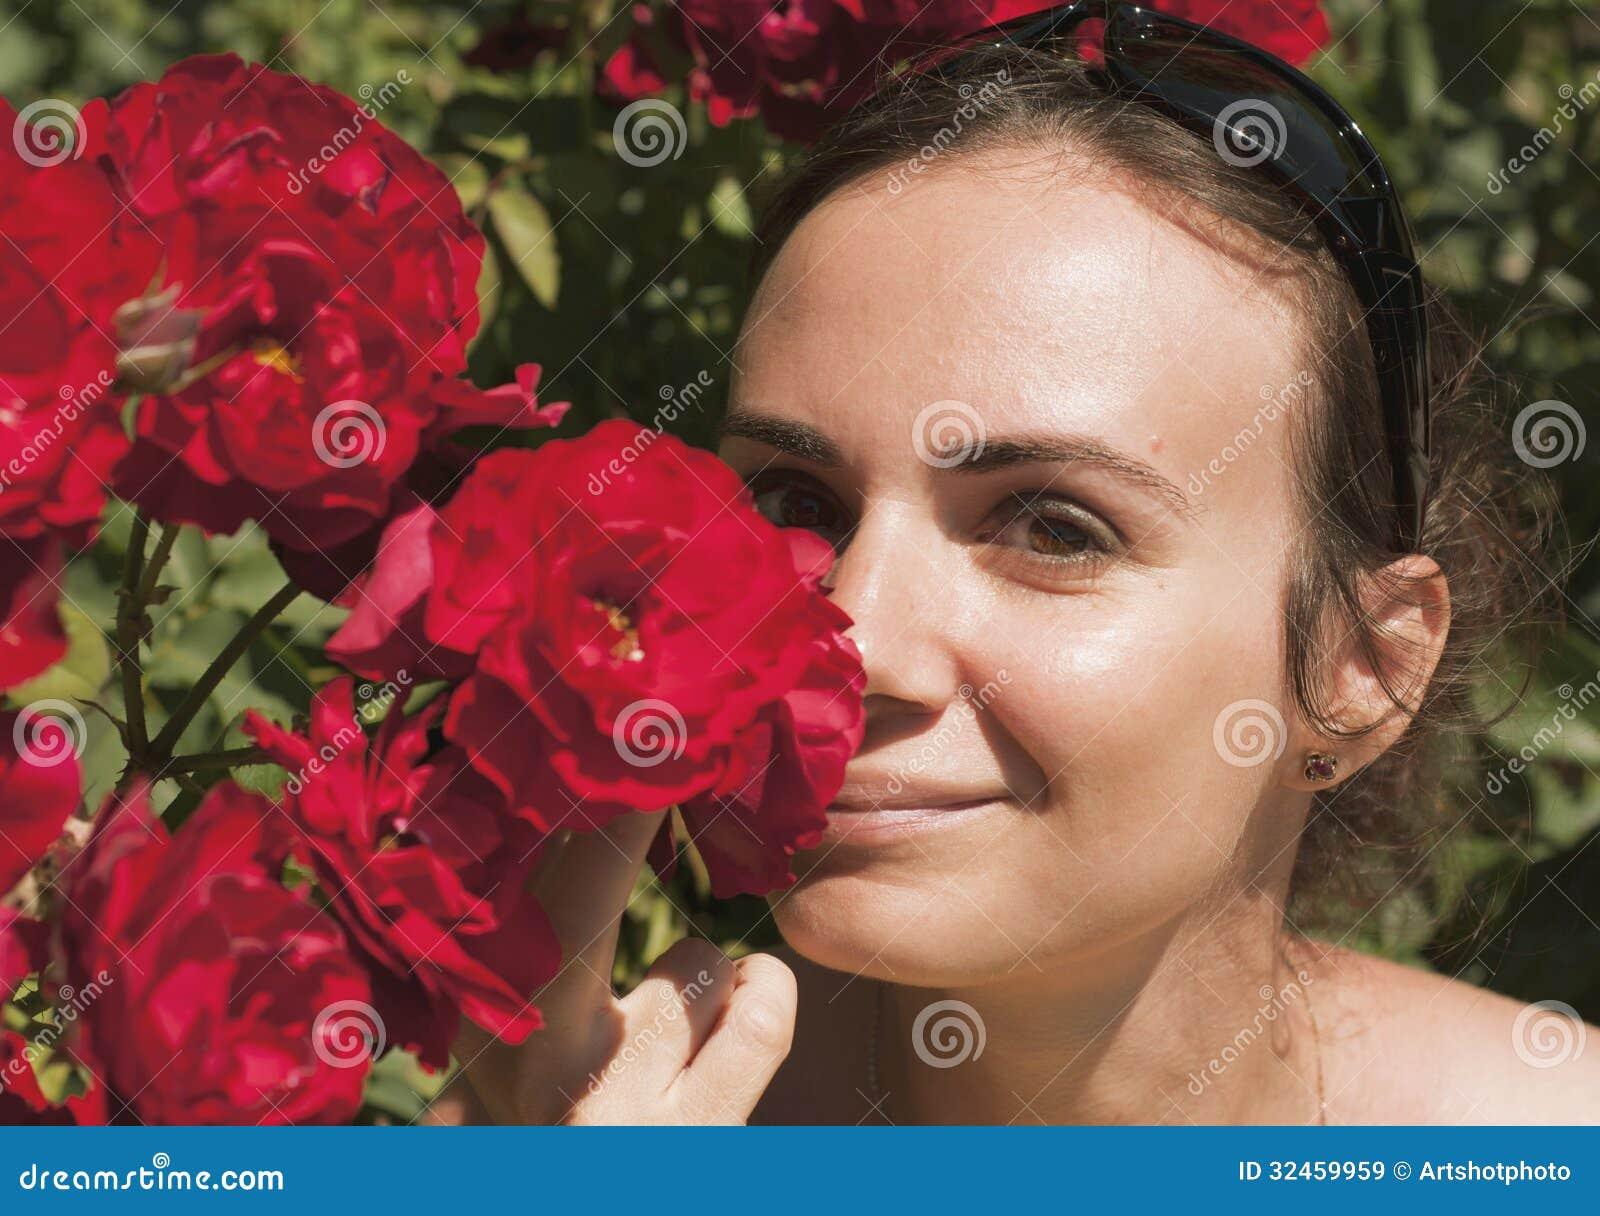 Riechende Rosen der jungen Frau